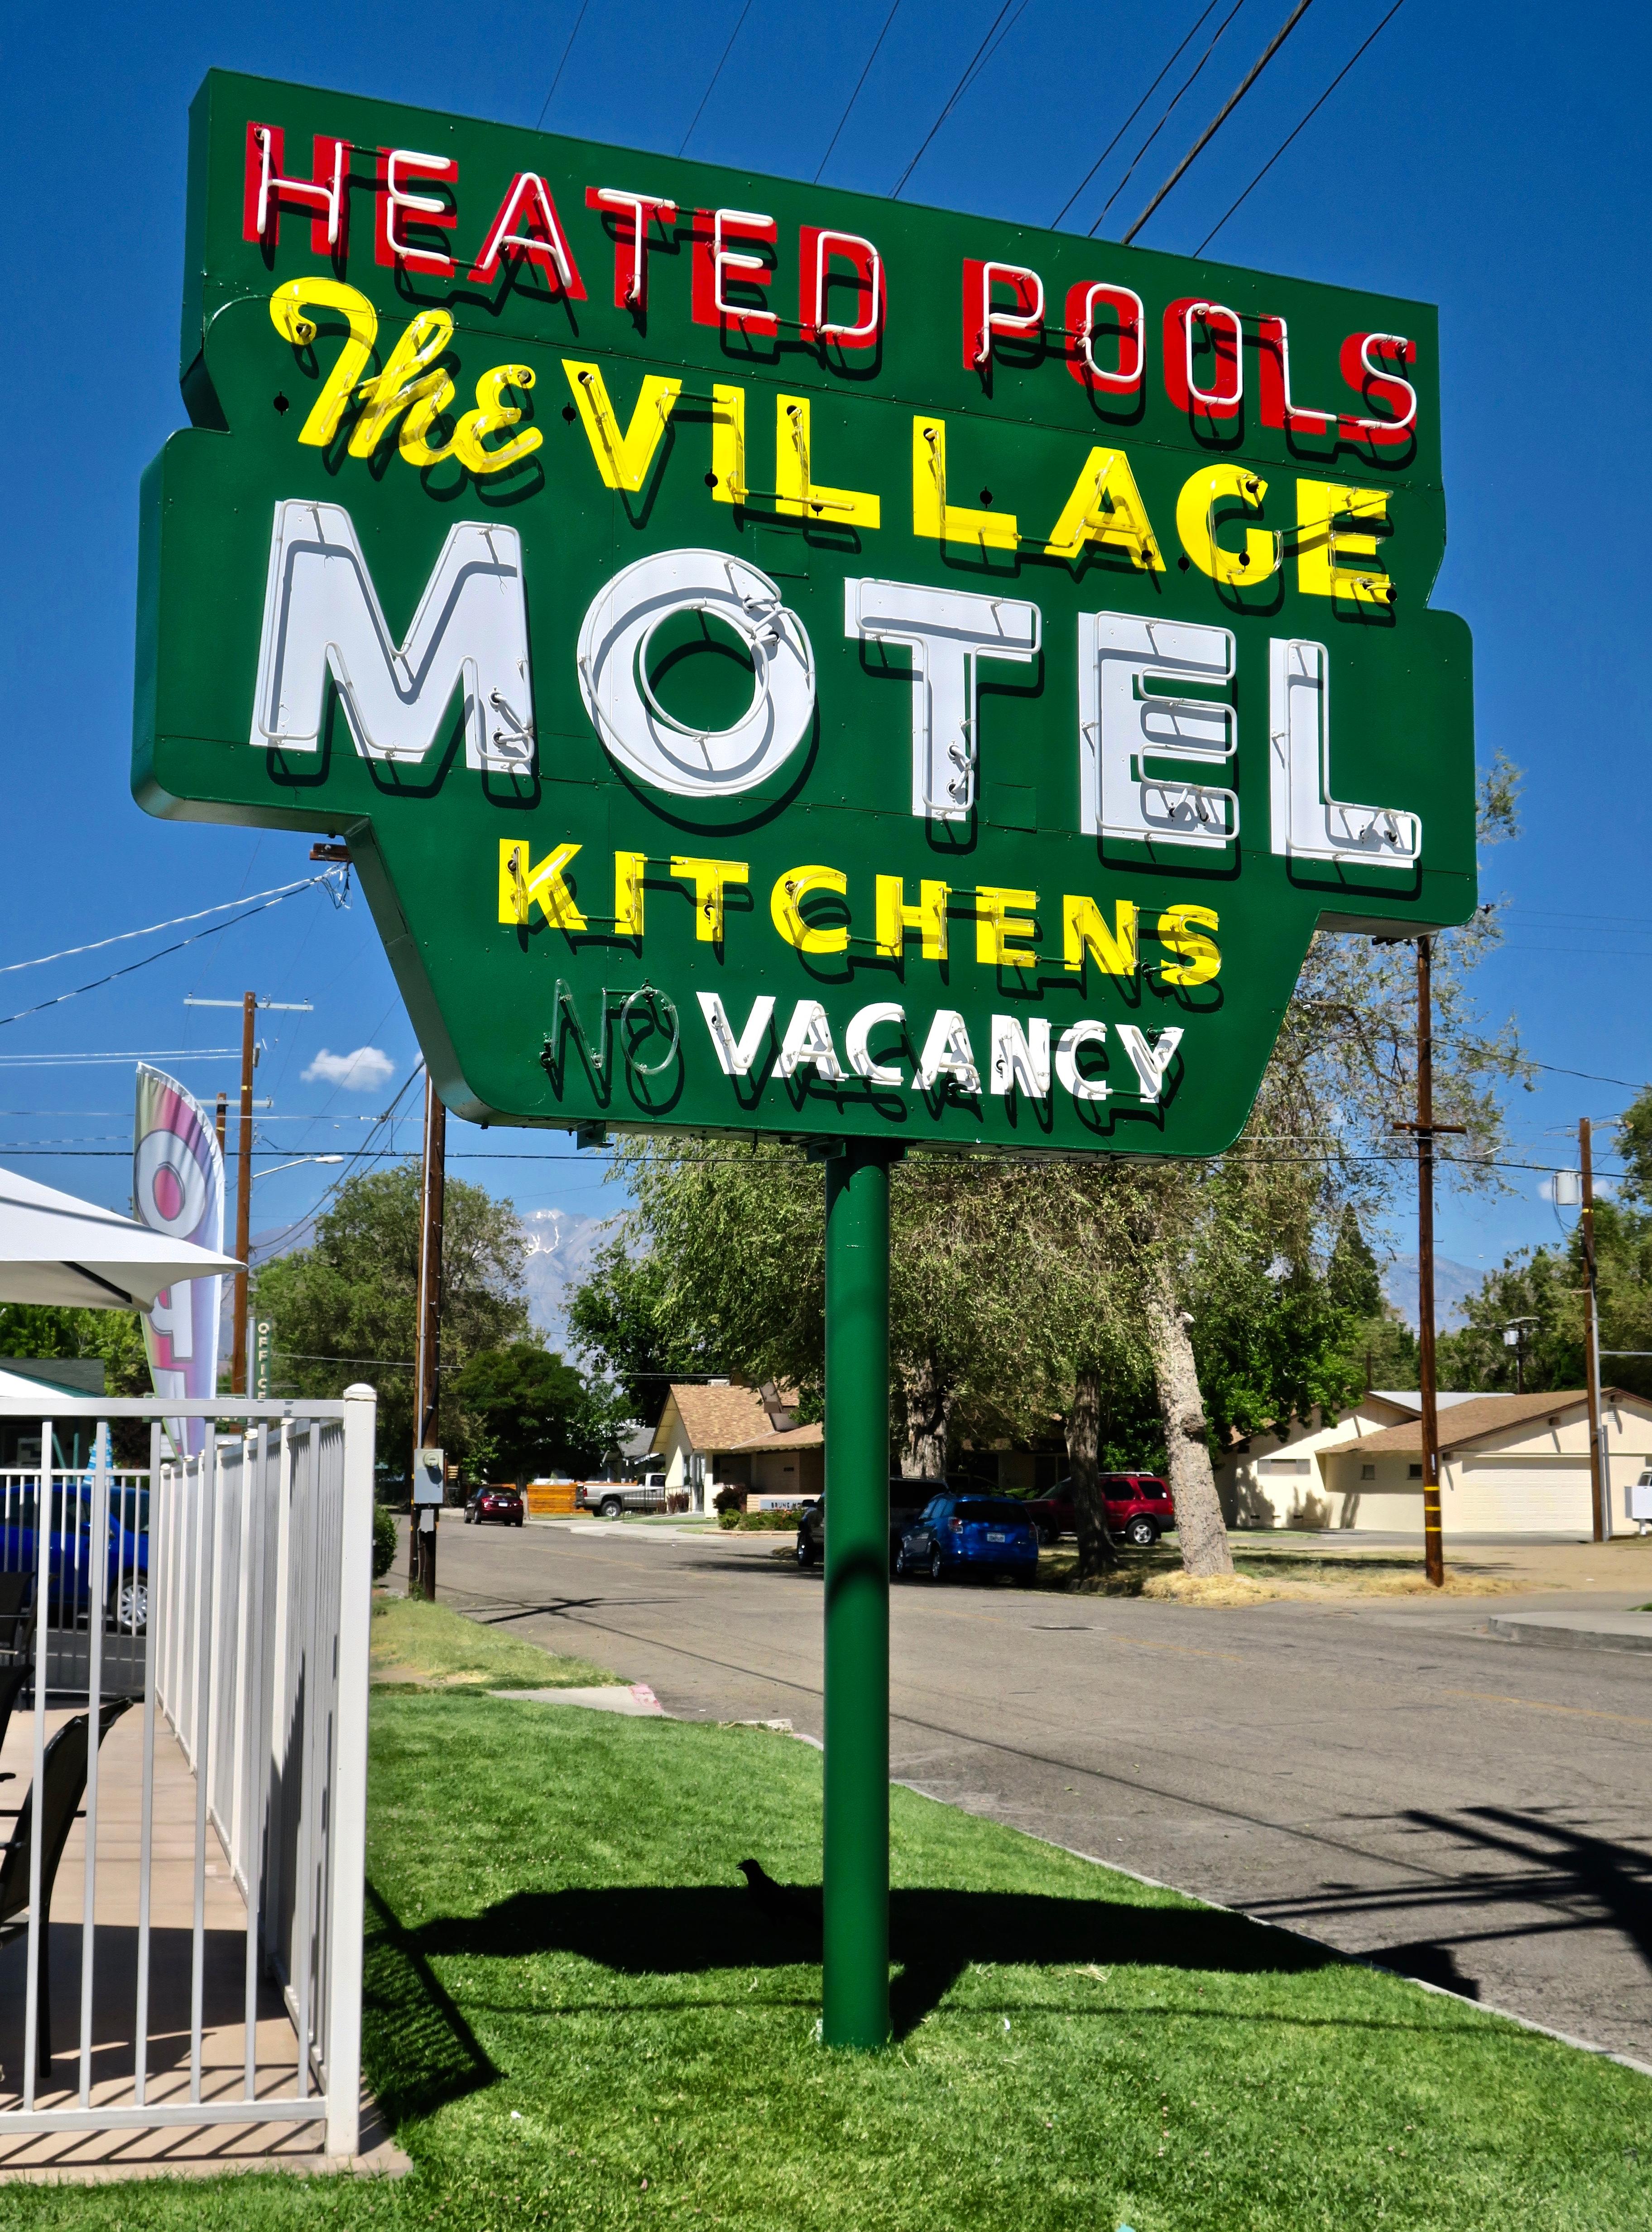 The Village Motel - 286 West Elm Street, Bishop, California U.S.A. - July 30, 2017